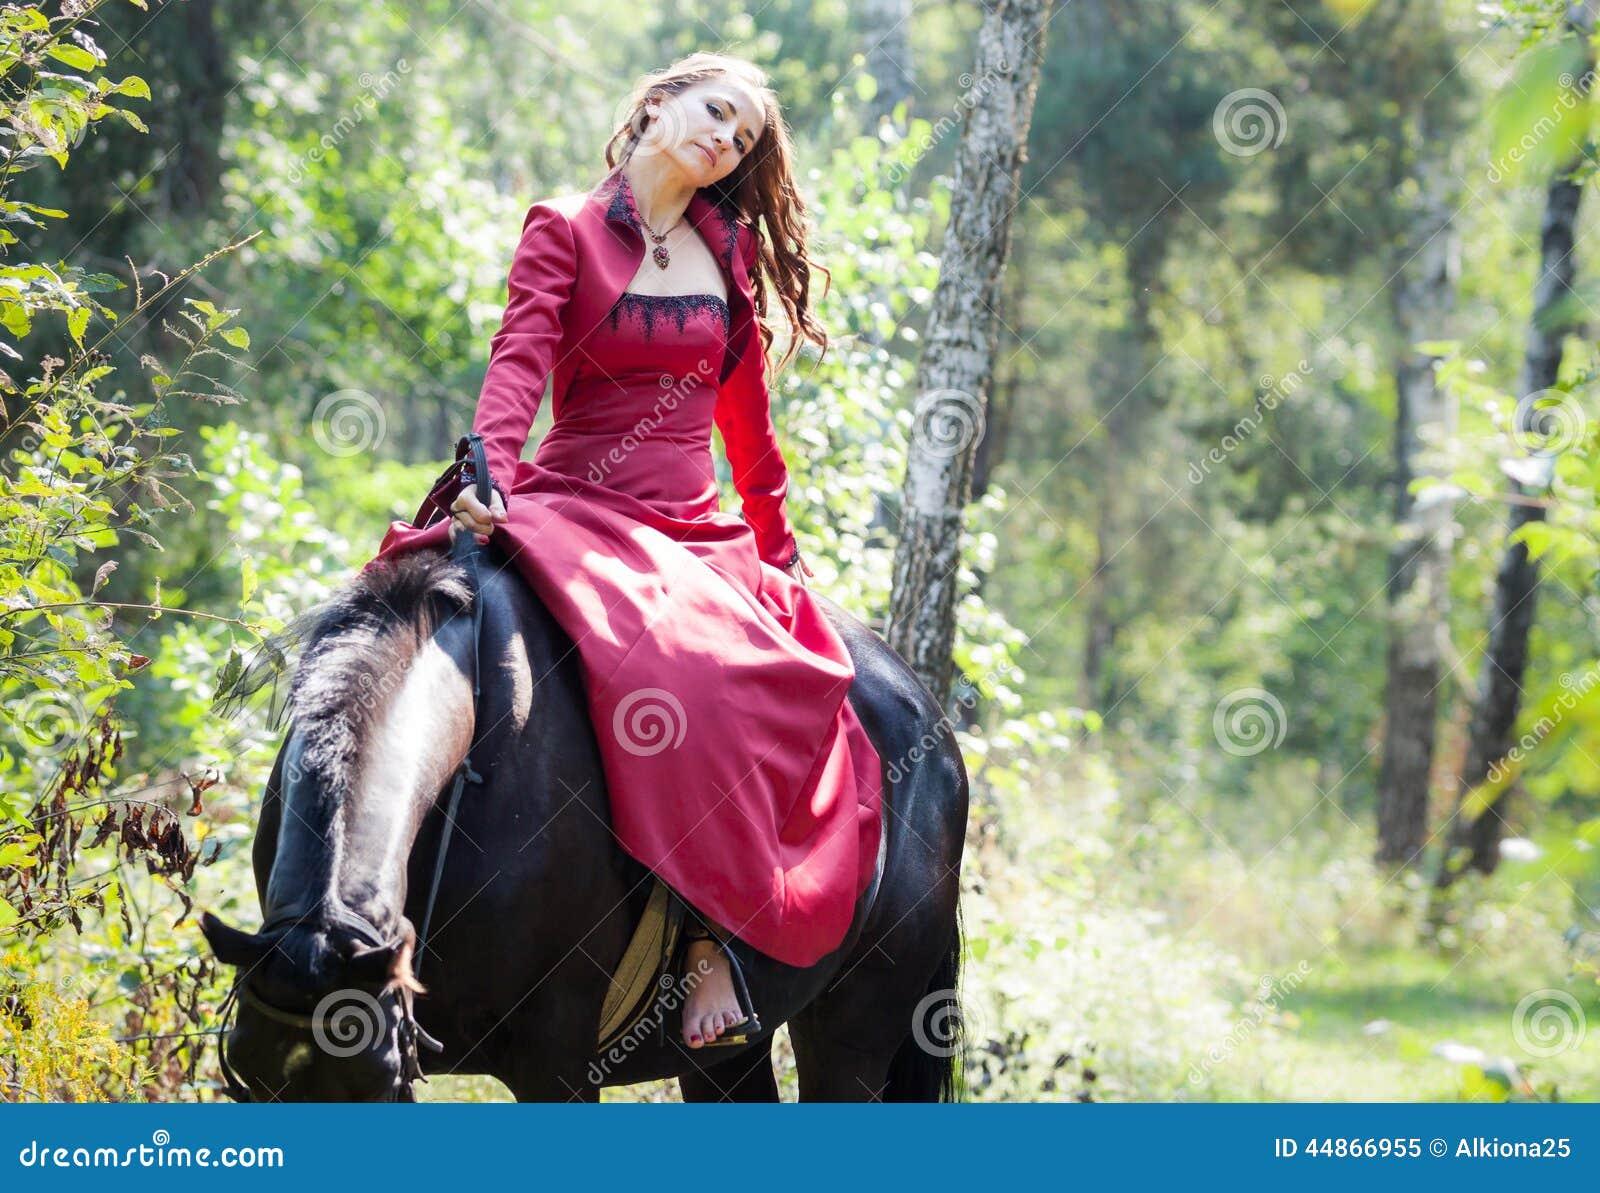 https://thumbs.dreamstime.com/z/brunette-girl-horse-young-beautiful-sit-back-black-green-forest-44866955.jpg